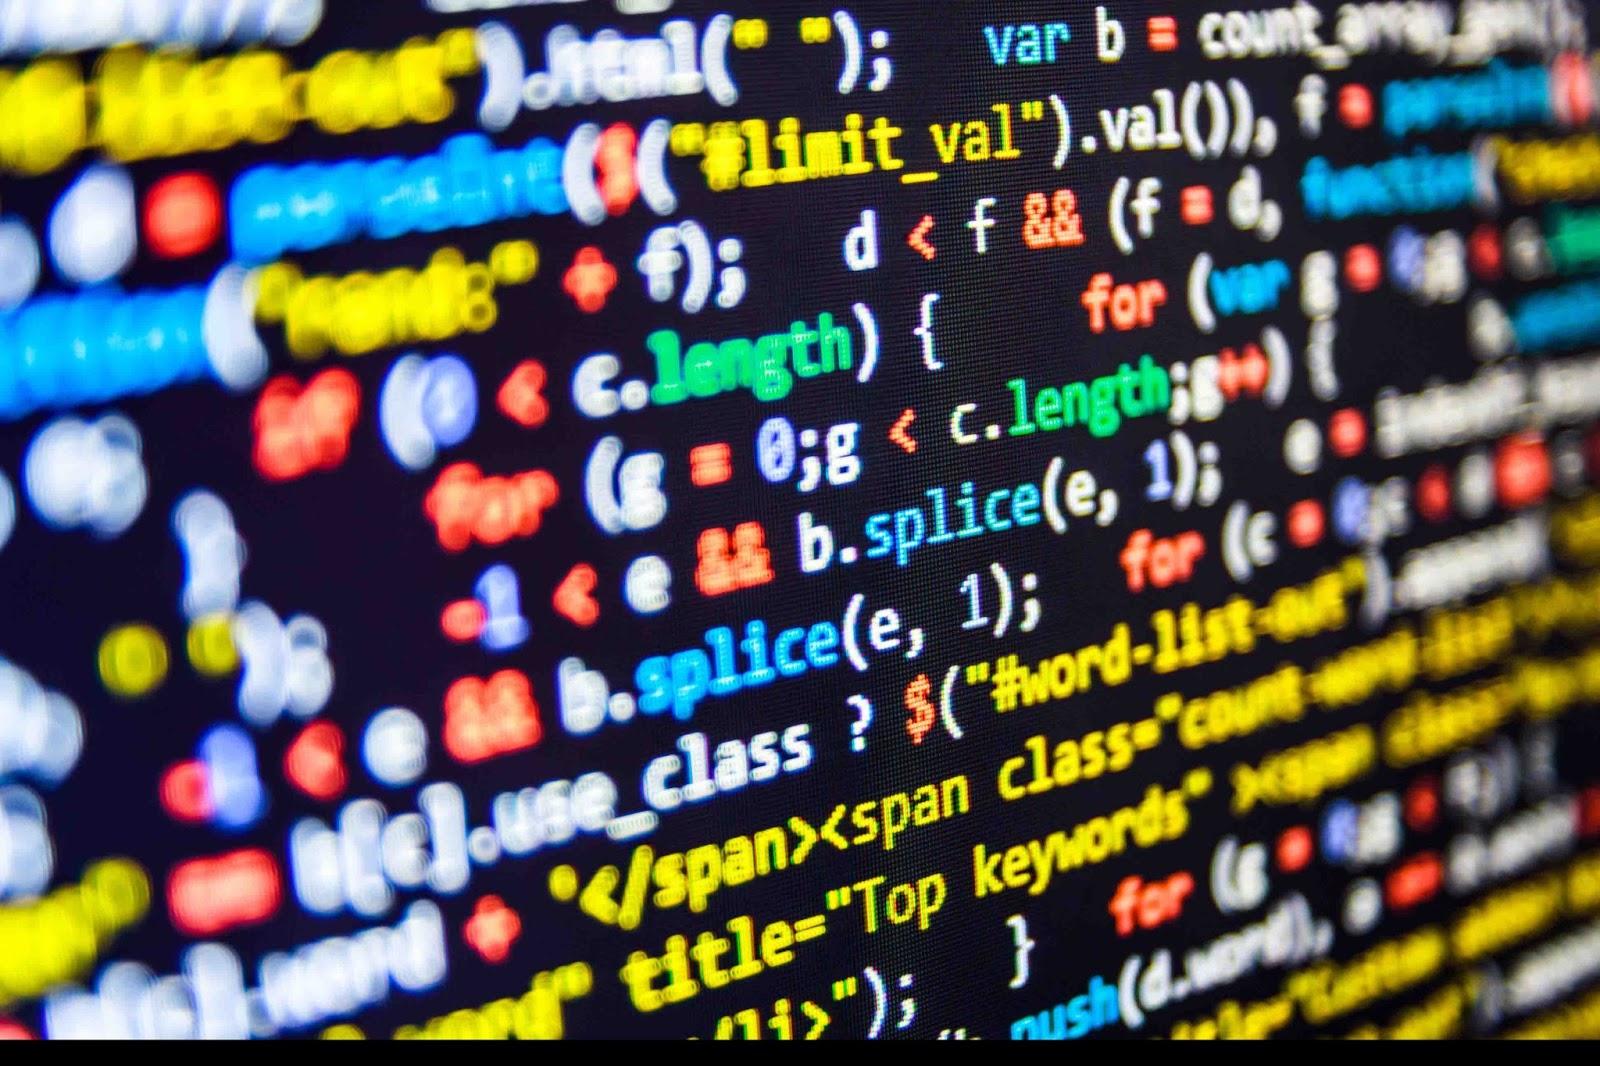 JavaScript VS Python - Big Data Engines